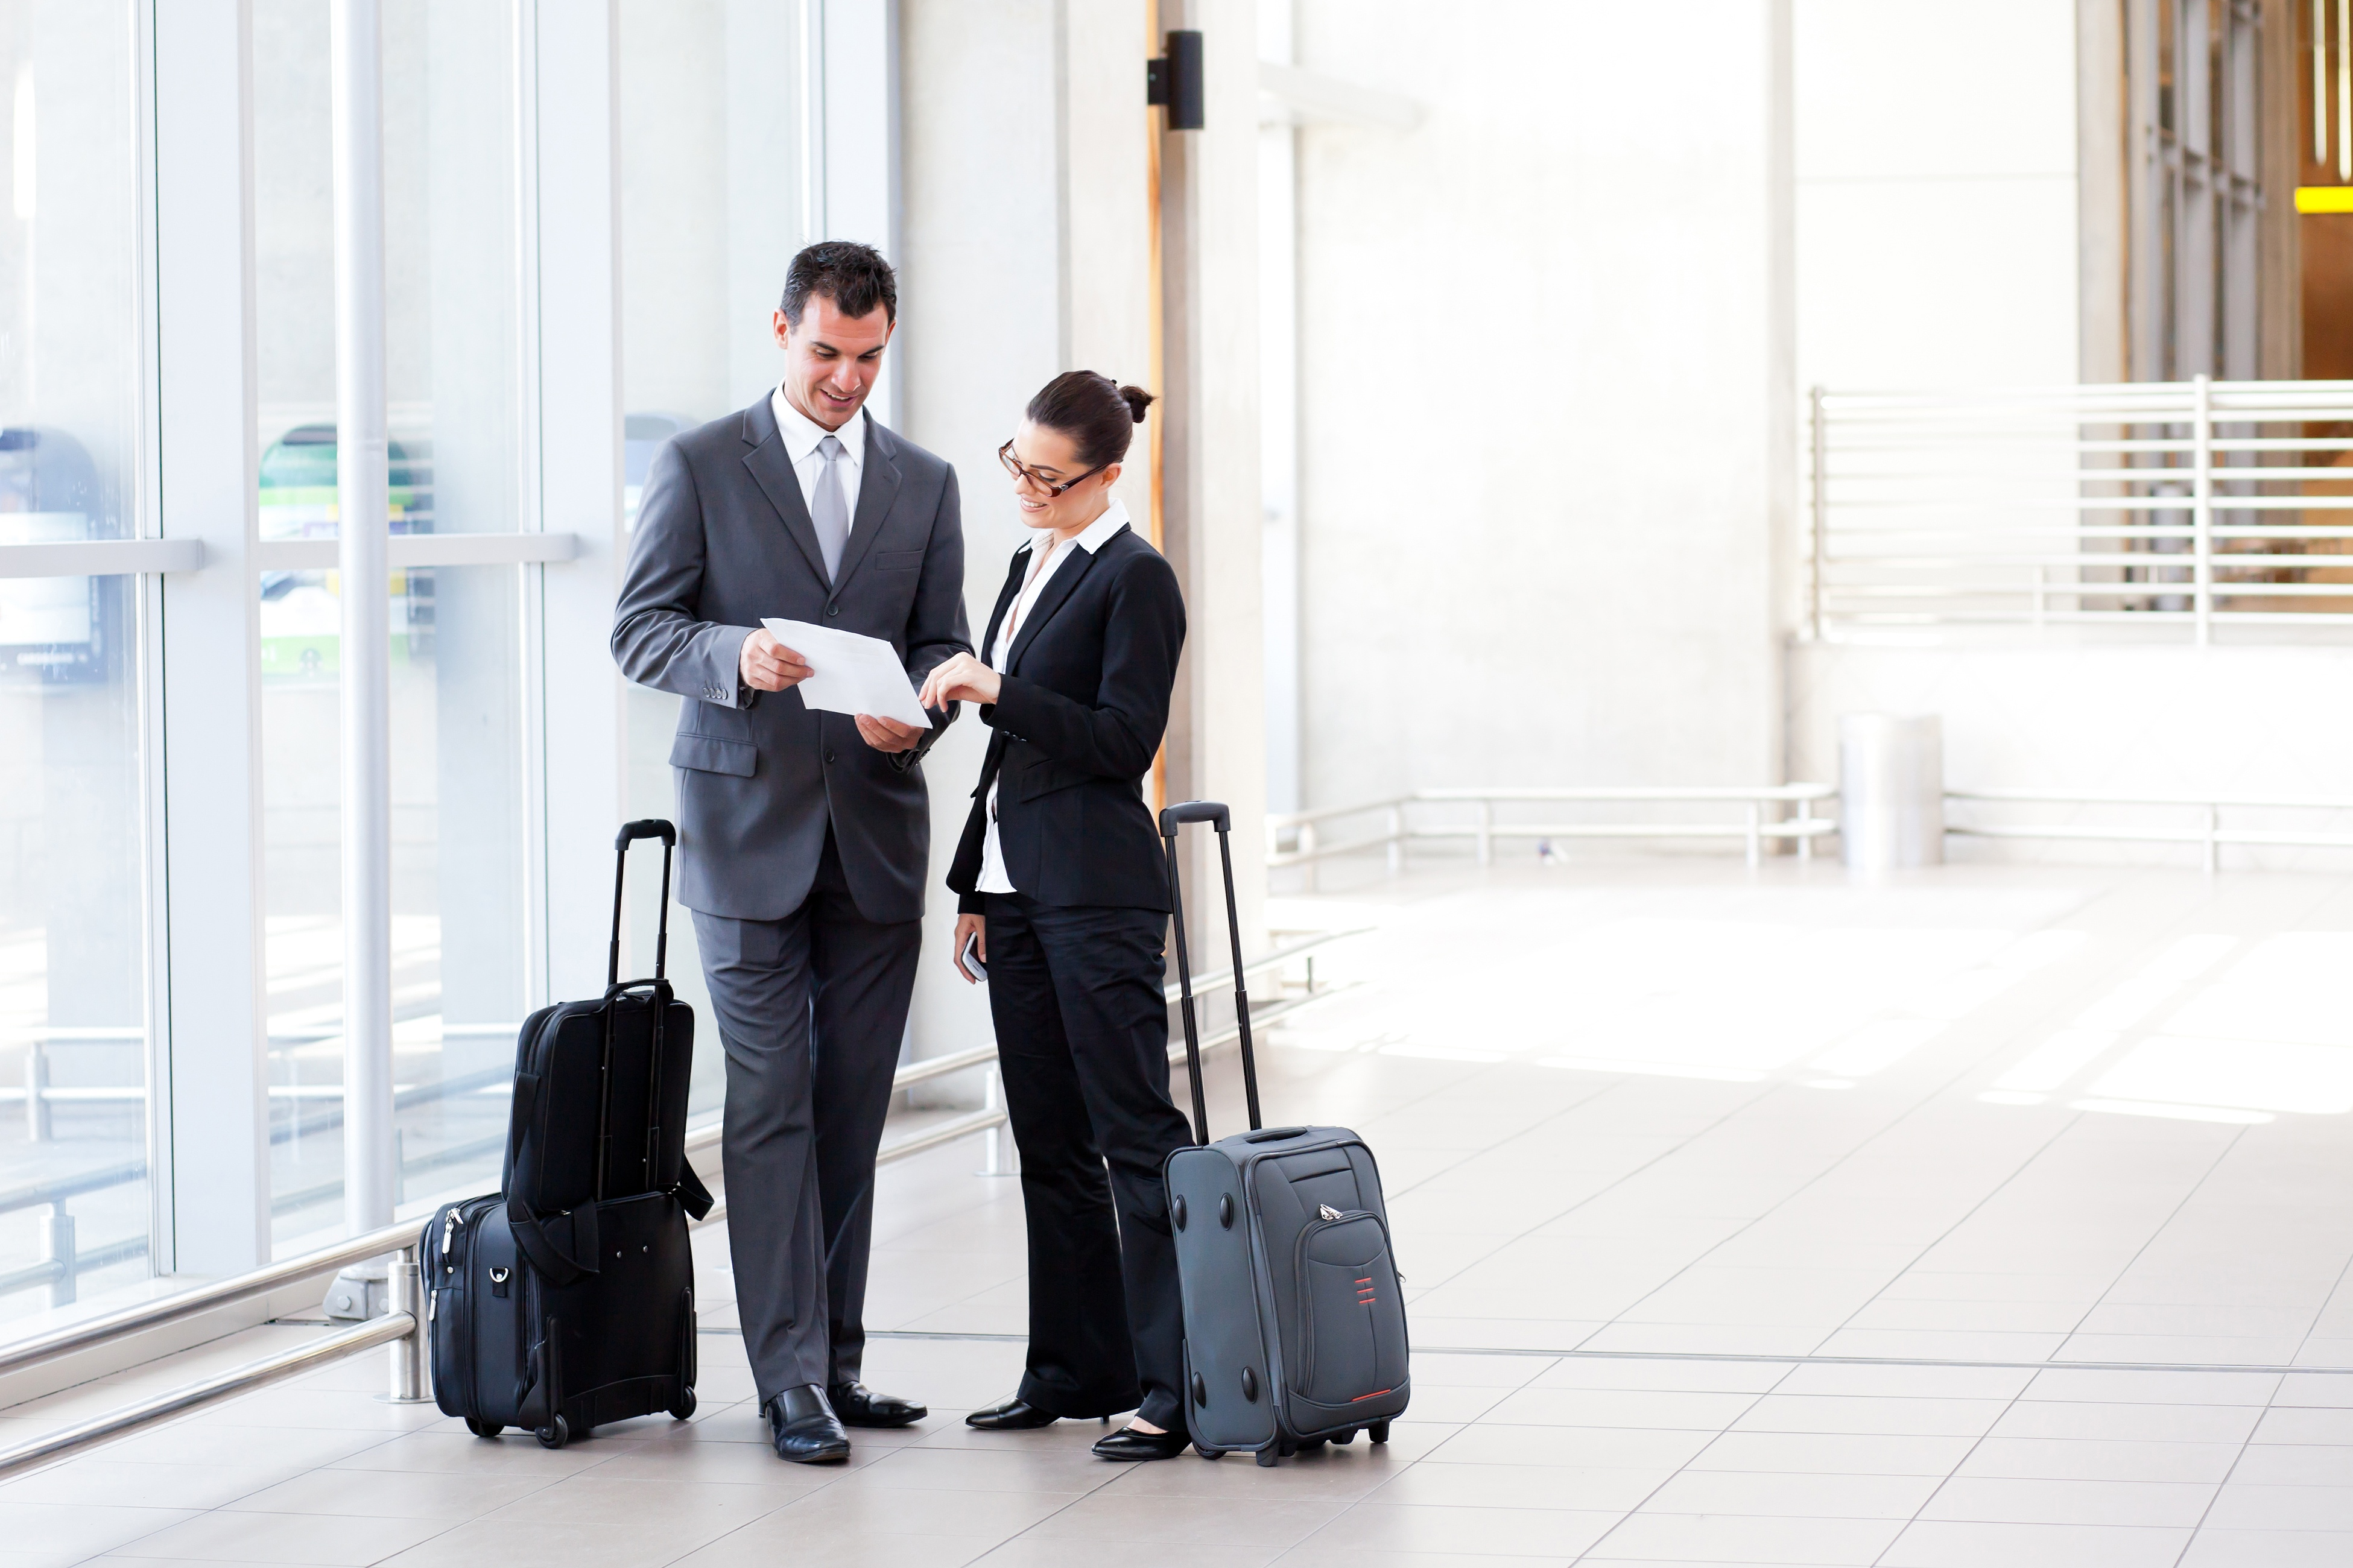 gasto en 2017 en business travel aumentara.jpg